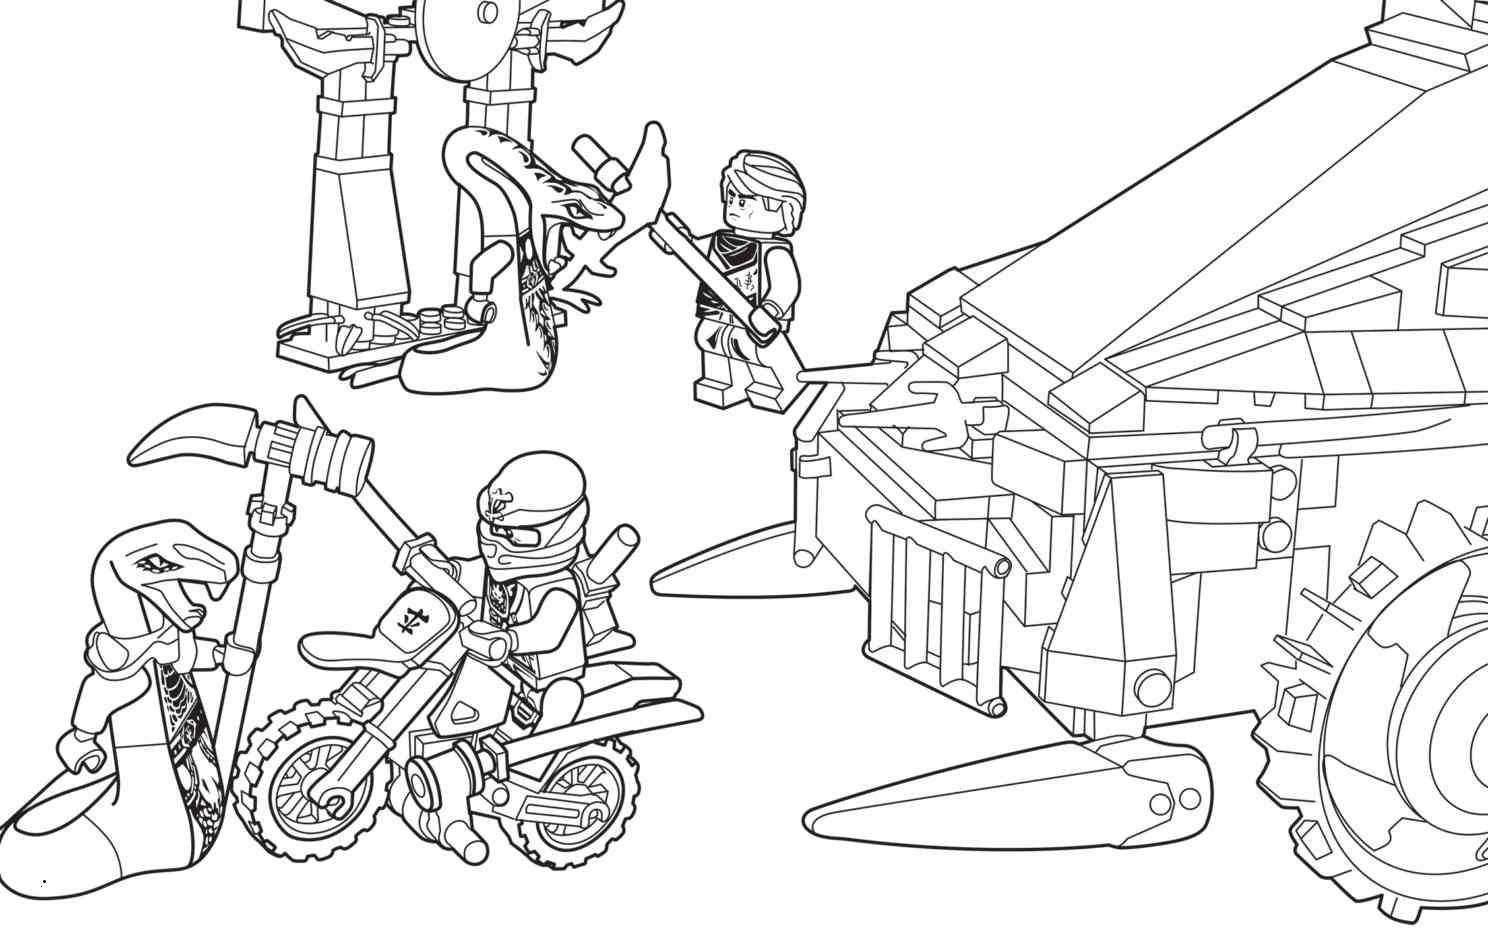 Ausmalbilder Ninjago Zane Genial Ninjago Ausmalbilder Lloyd 2015 Einzigartig Lego Ninjago Chen Fotos